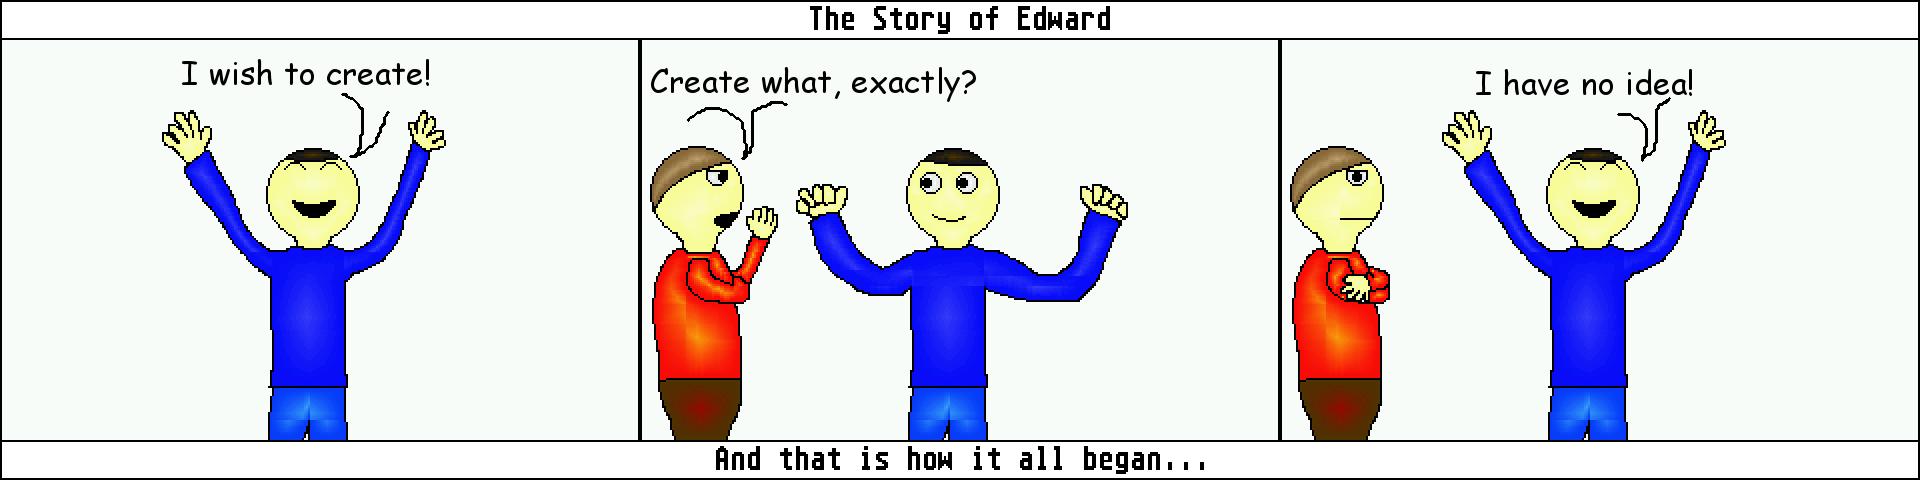 The Story of Edward